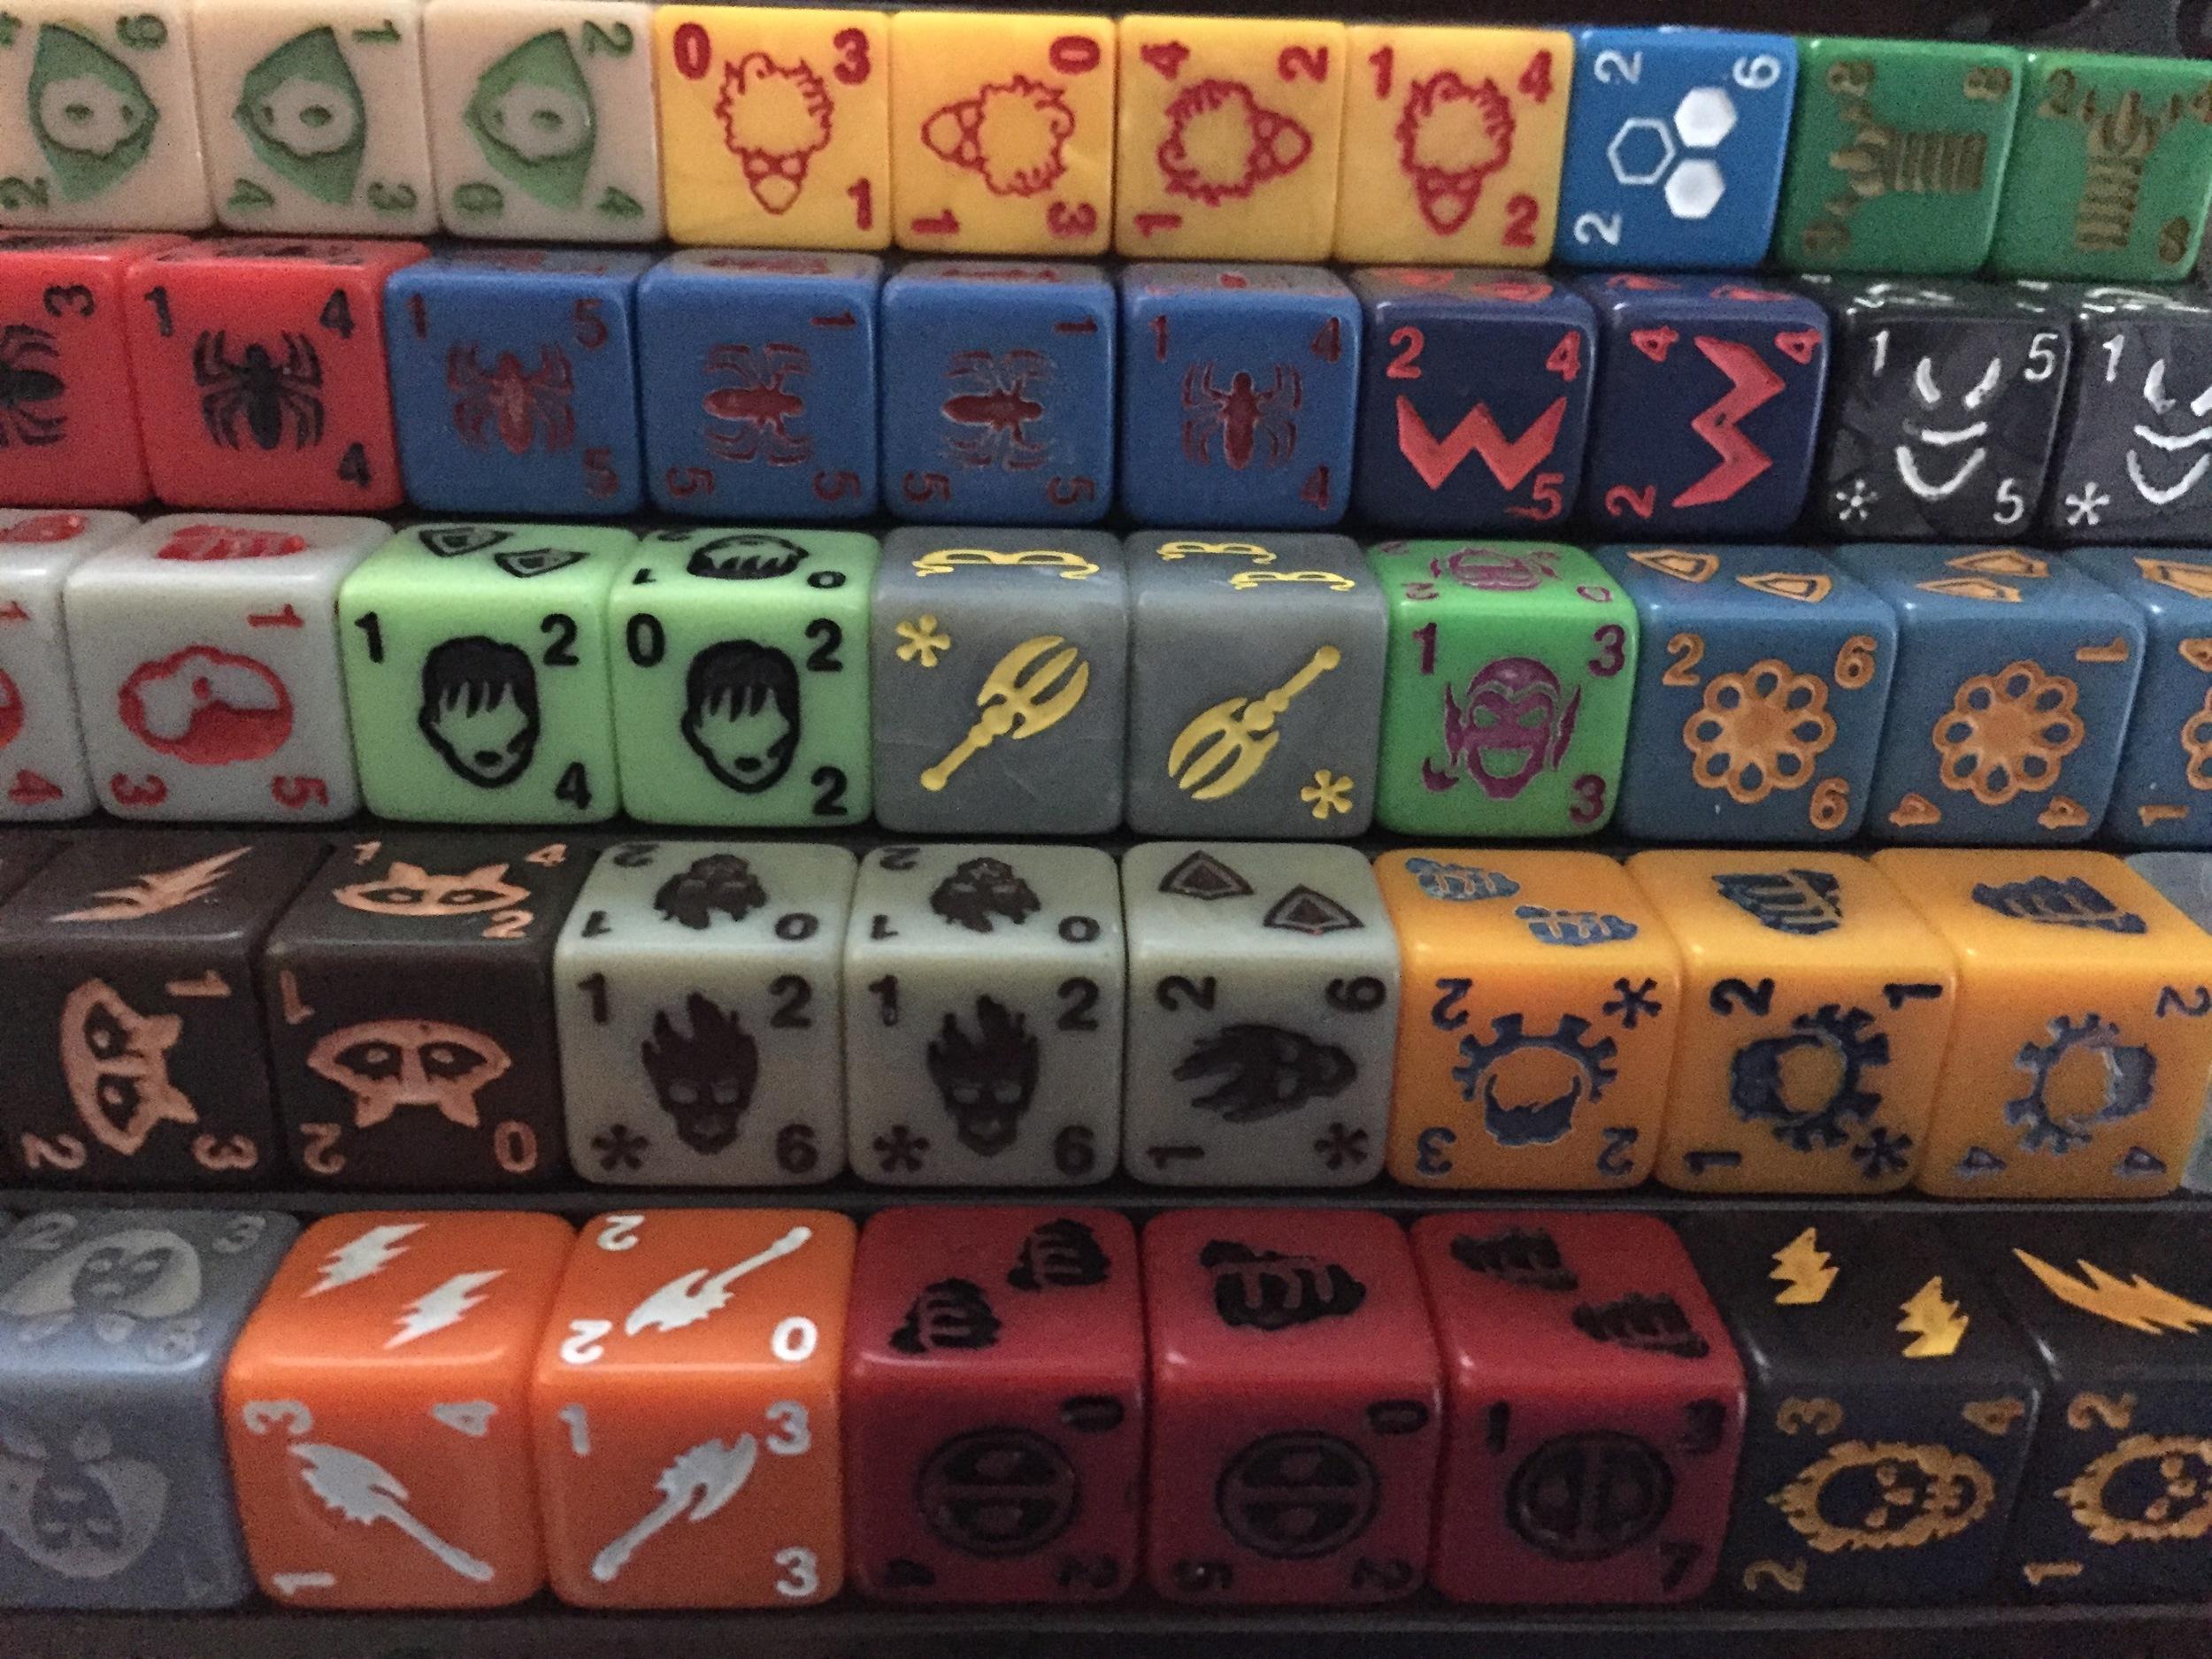 The Zen Bins help organize dice neatly and efficeintly.